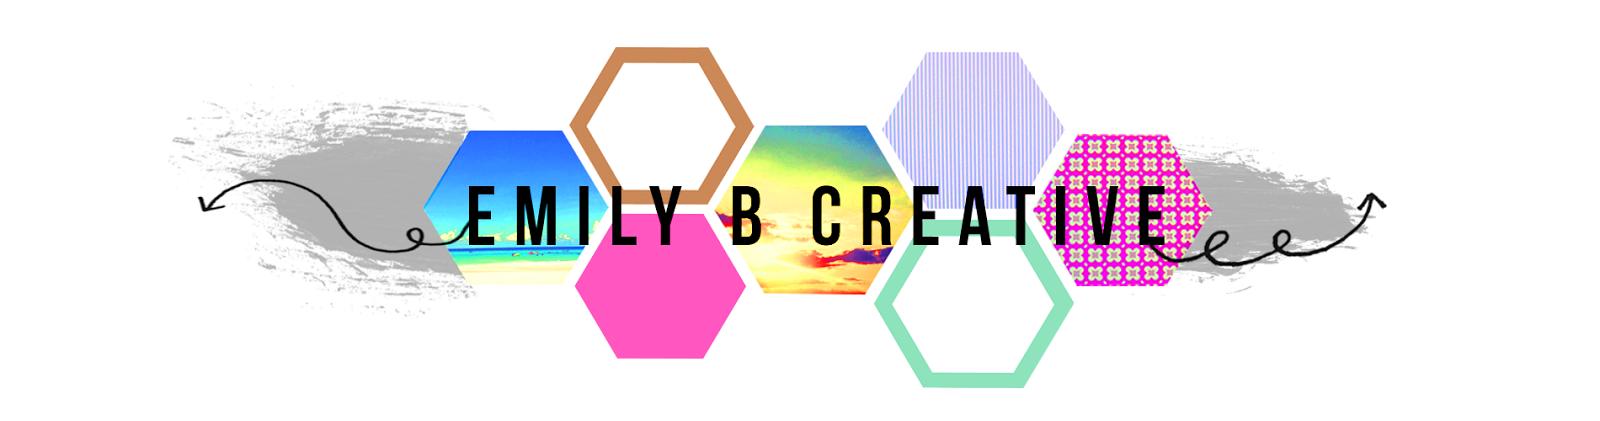 Emily B Creative